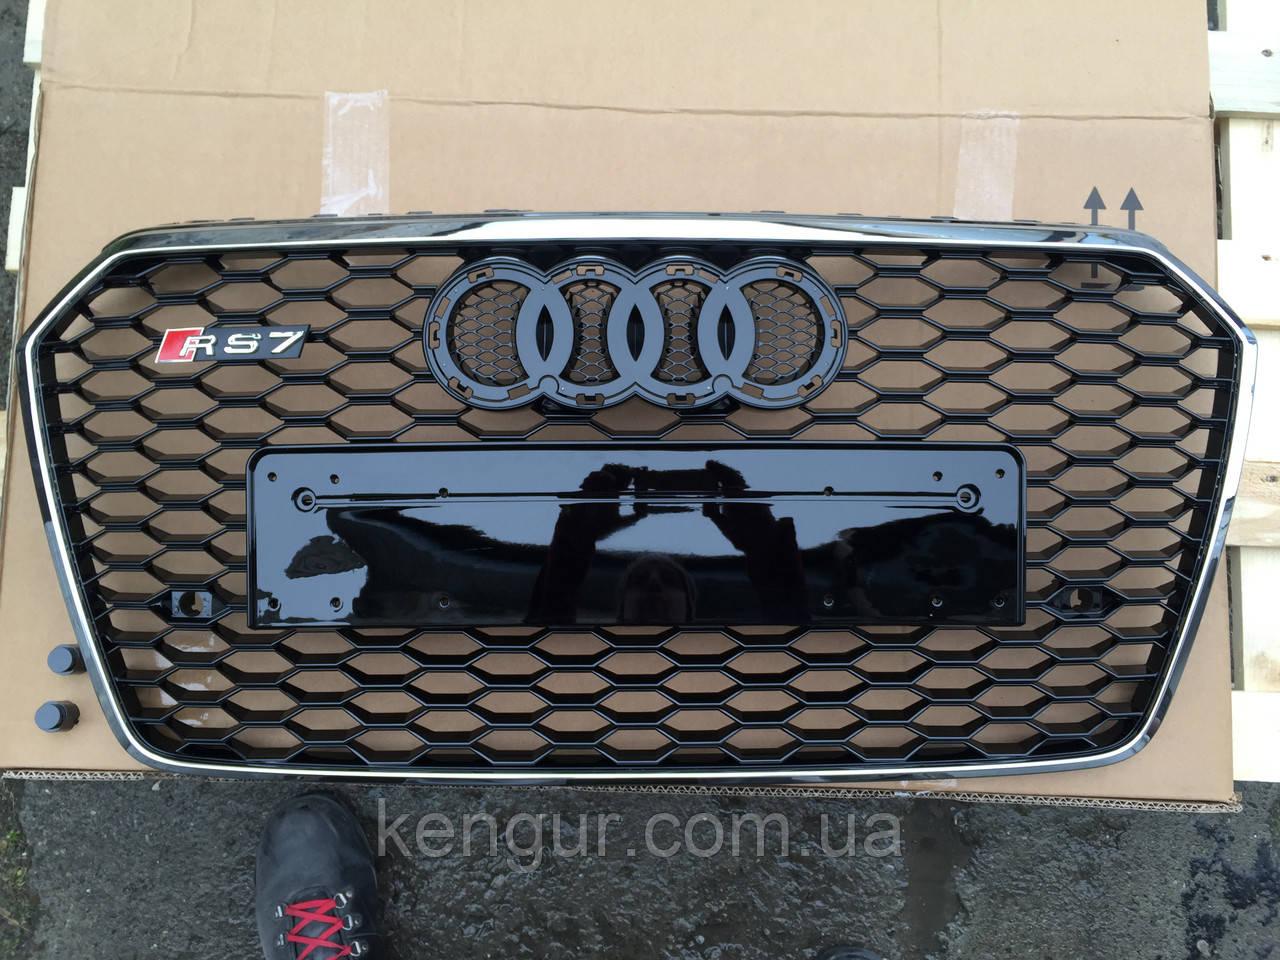 Решетка радиатора Audi A7 2015-